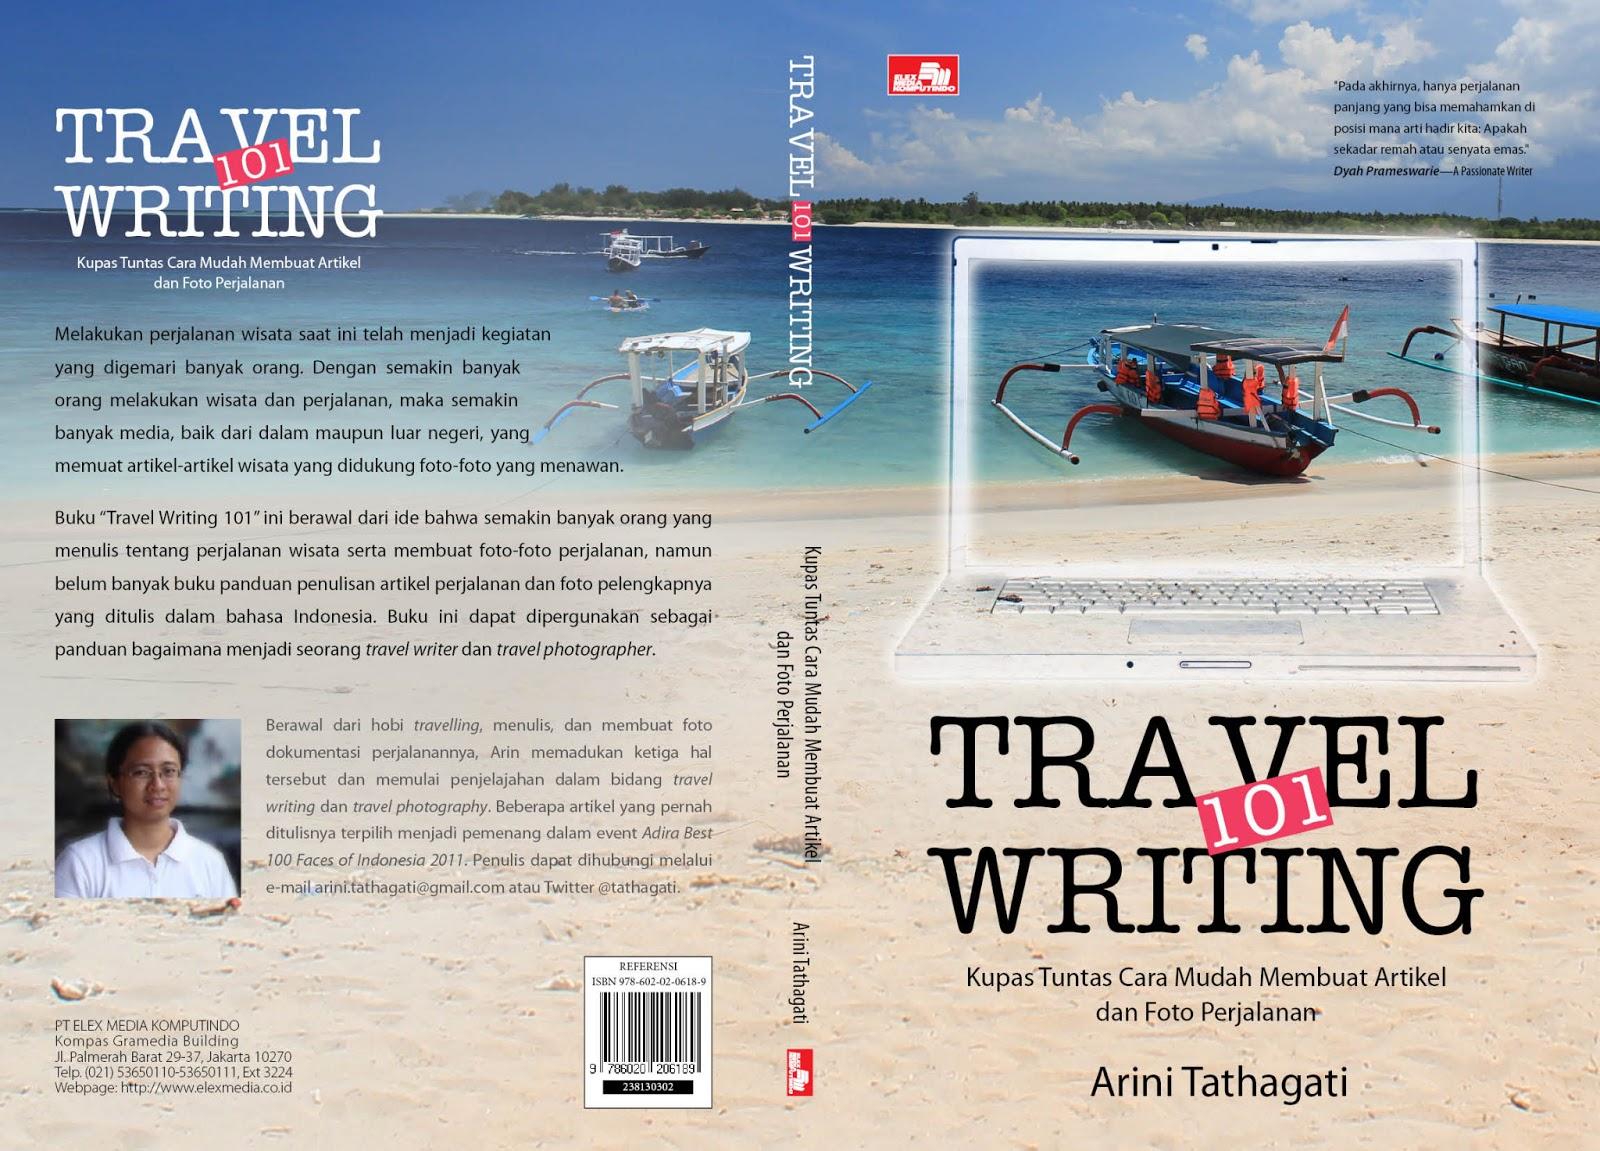 Rhien S Travel Writing Blog Travel Writing Is Easy